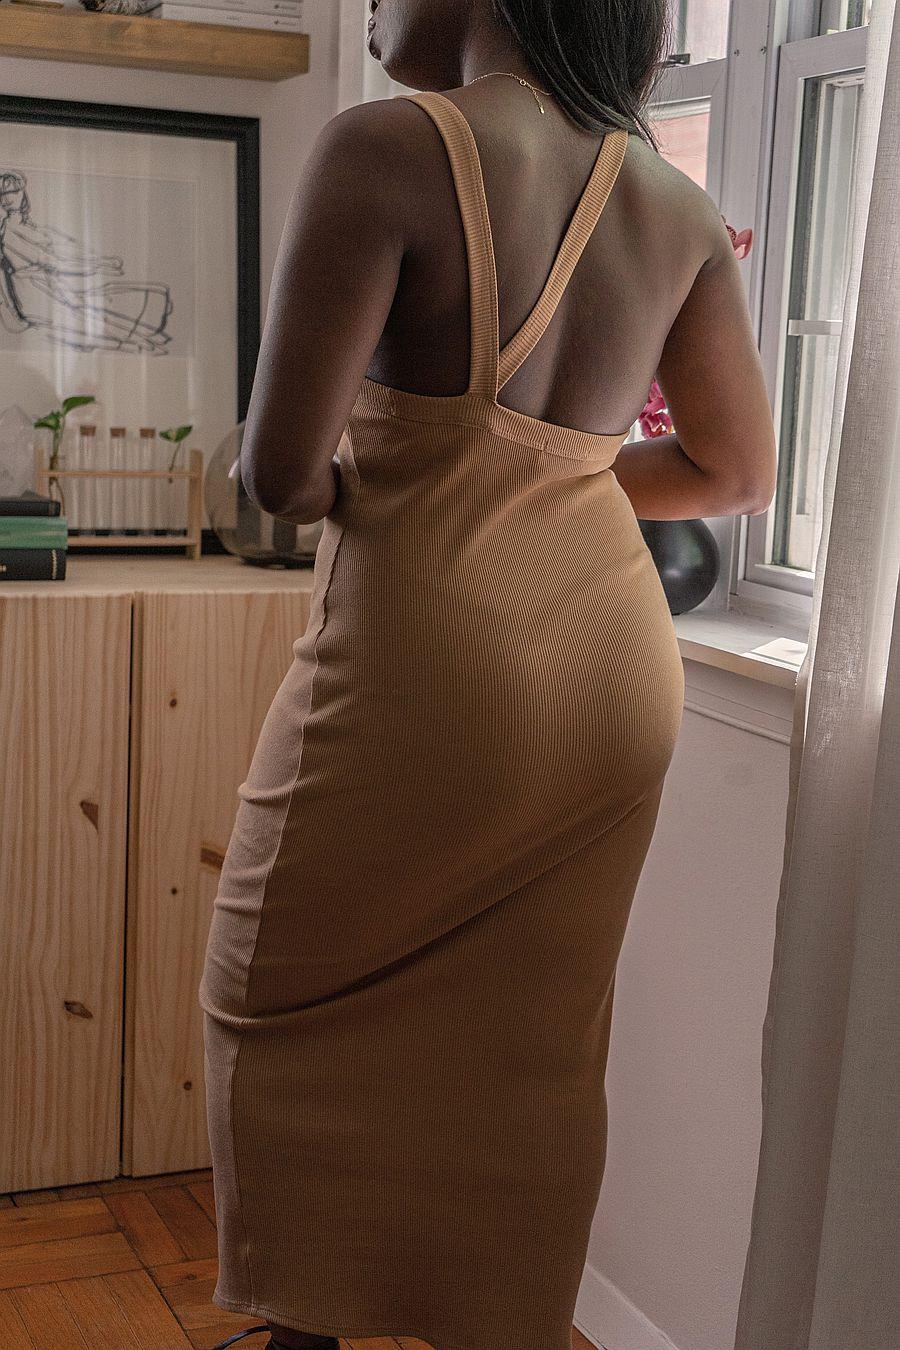 The Line by K Maribel Dress - Camel